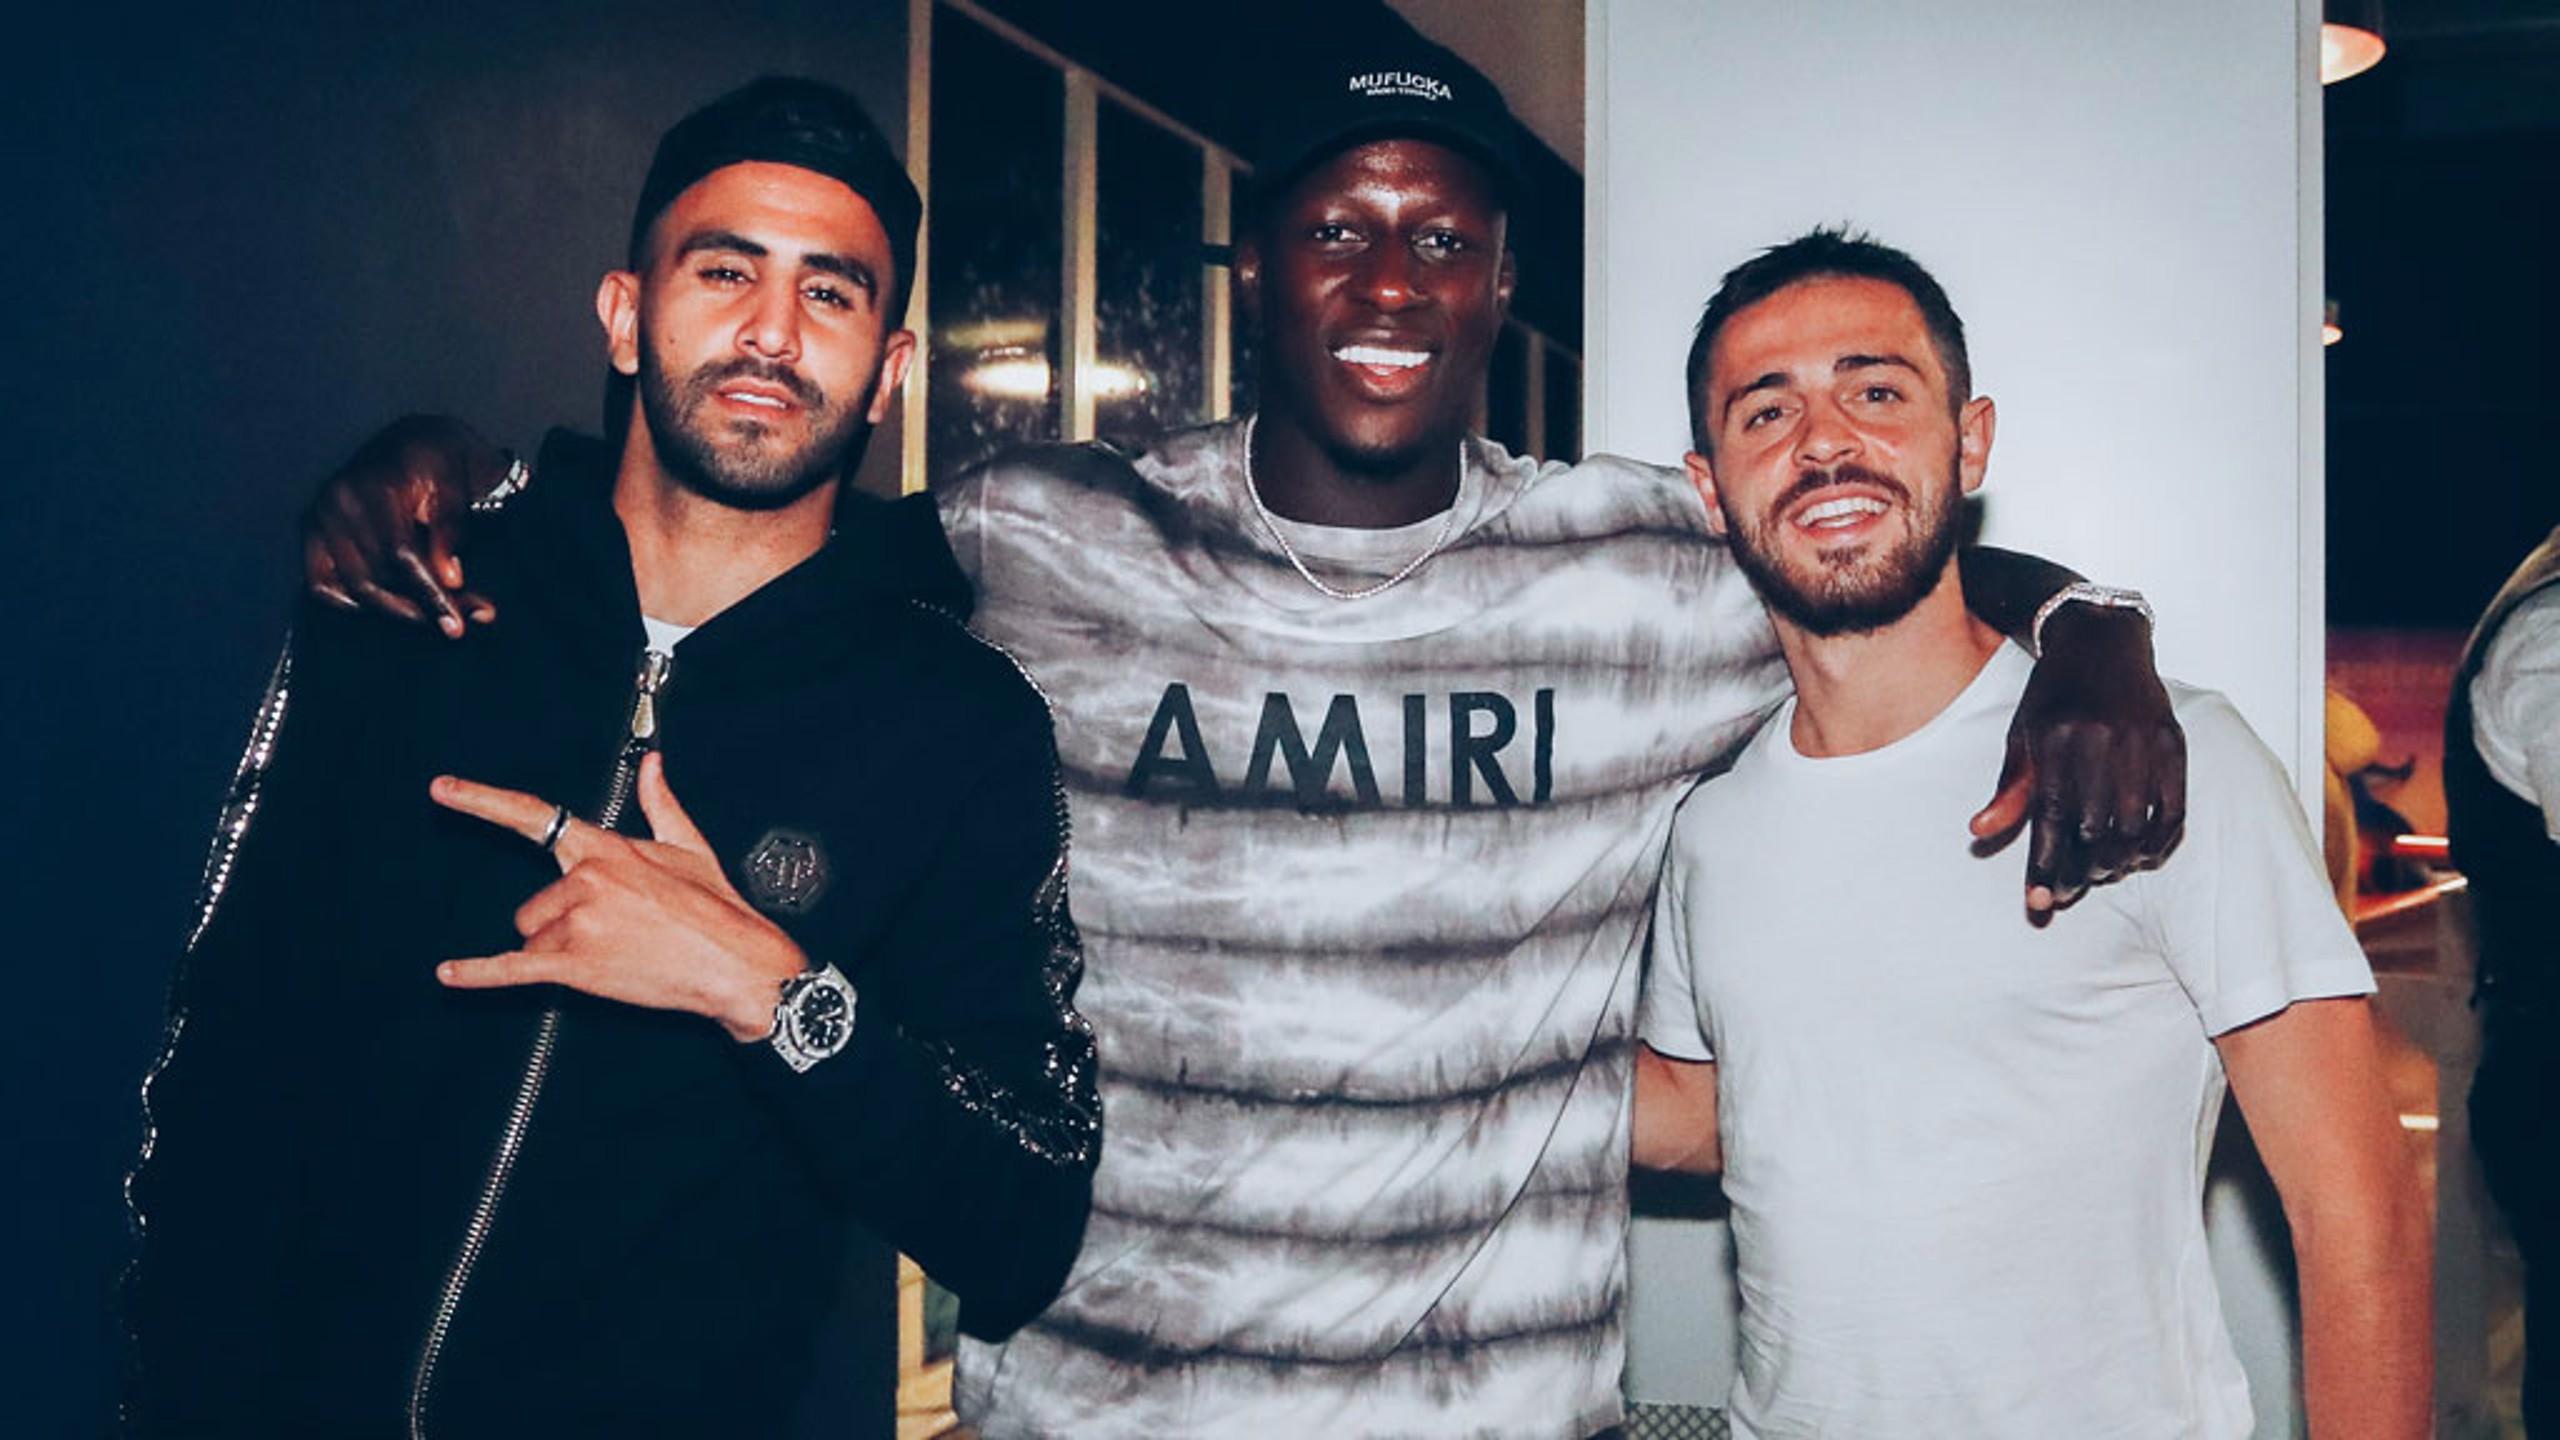 THREE AMIGOS: An excited trio of Riyad Mahrez, Benjamin Mendy and Bernardo Silva